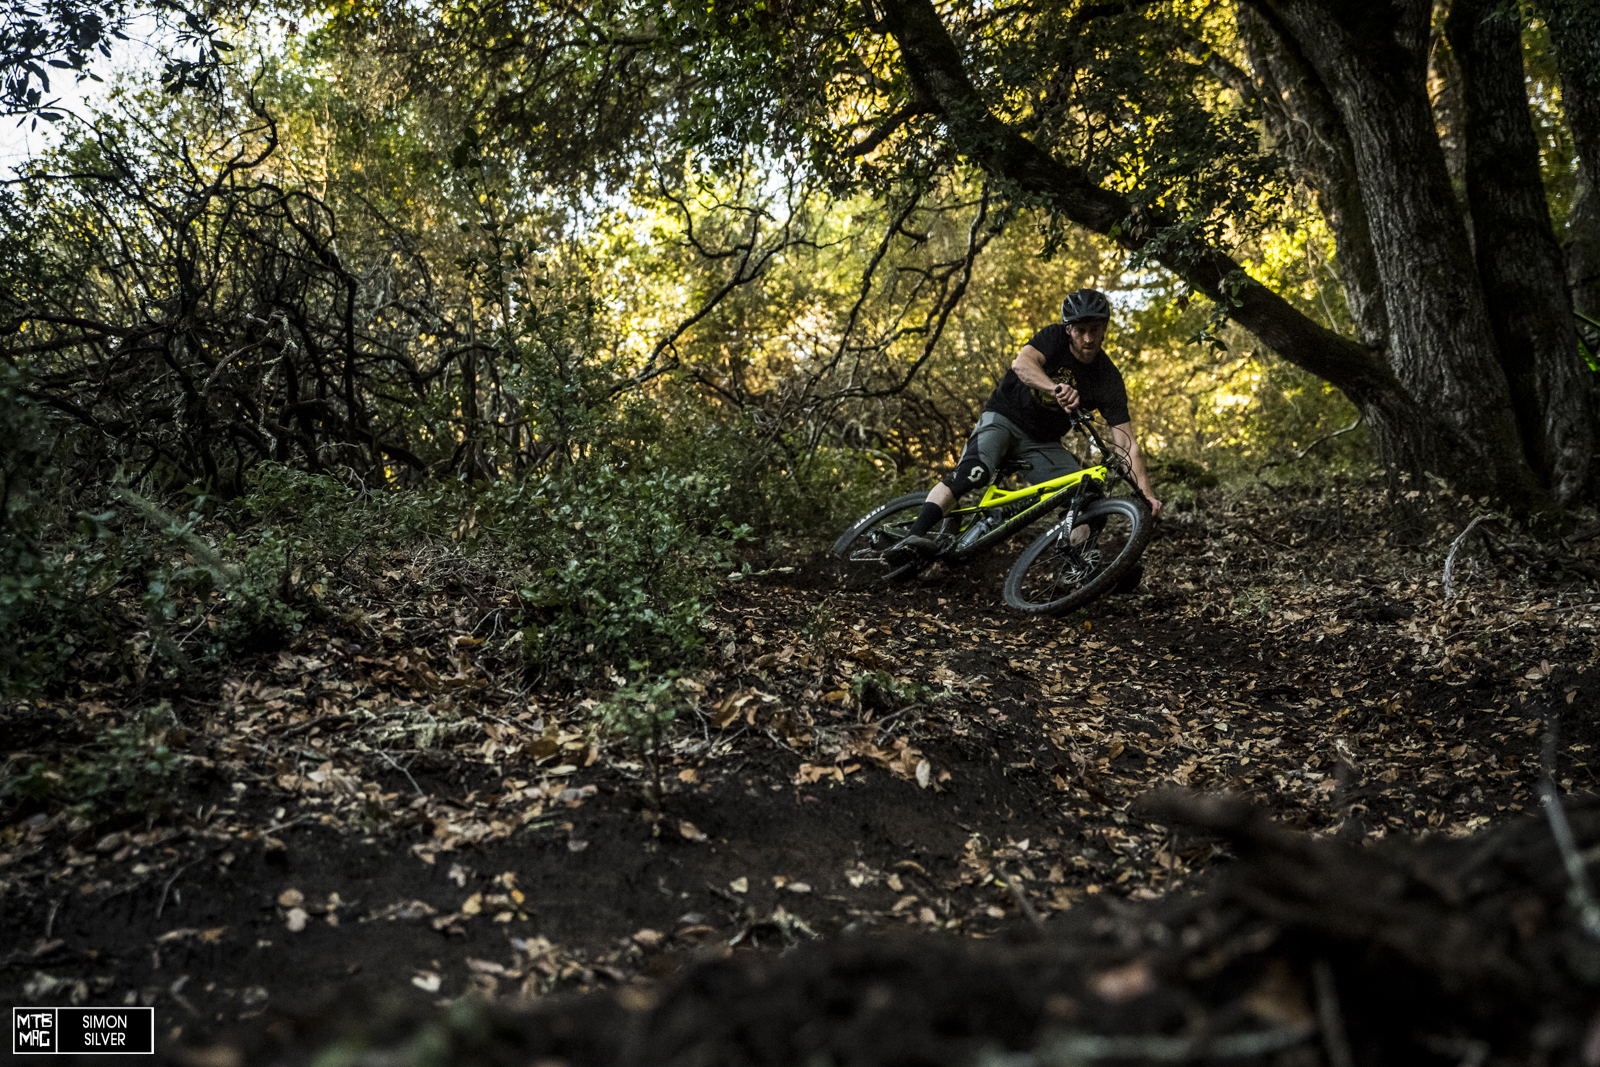 MTB-MAG COM - Mountain Bike Magazine | [Tested] RockShox